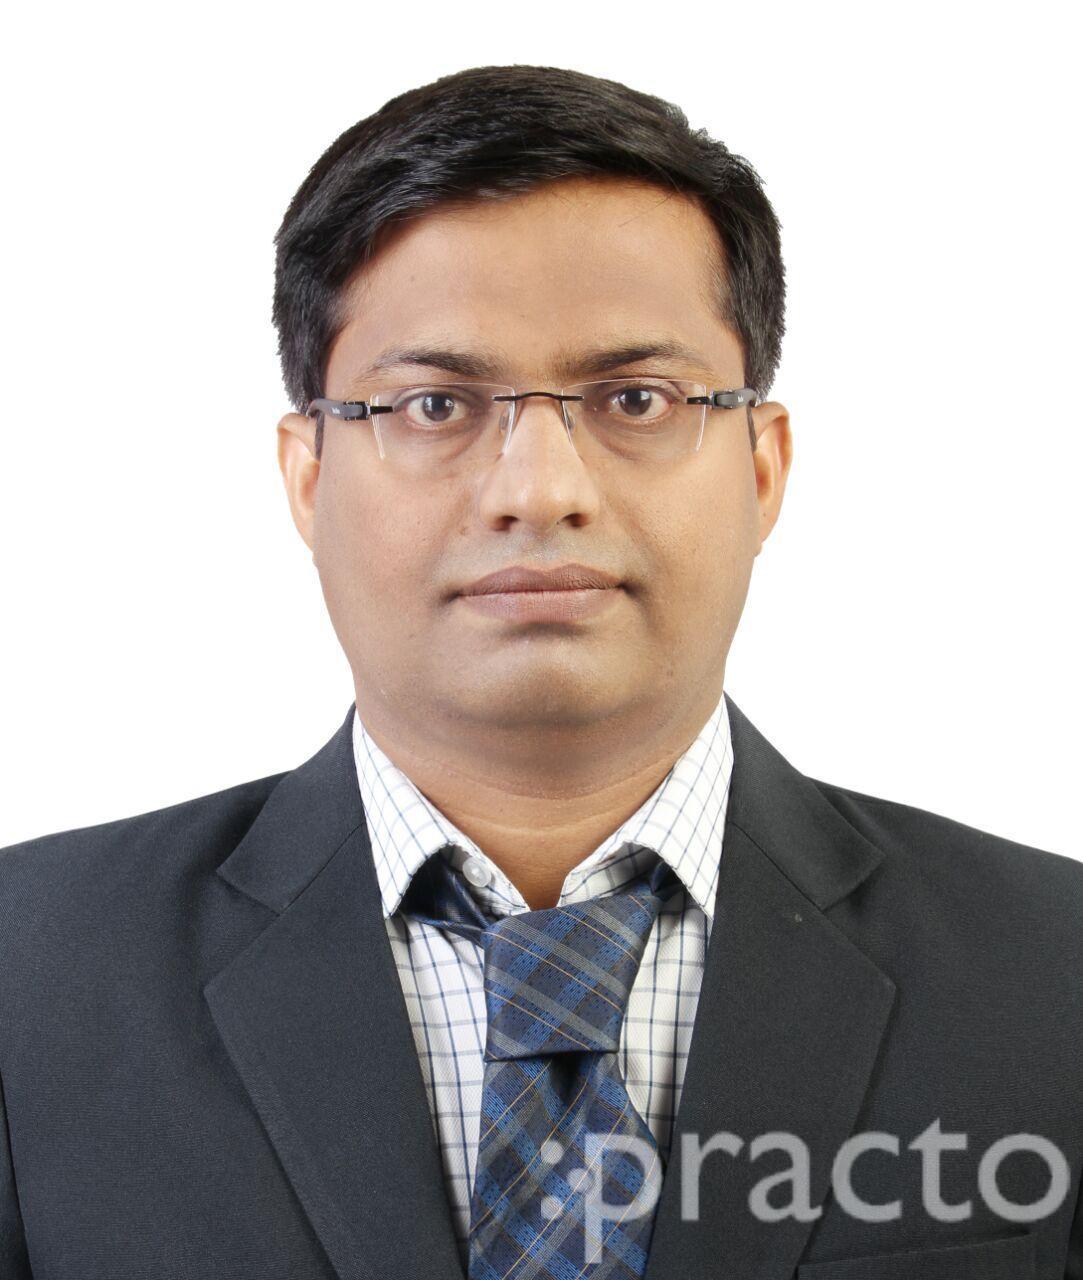 Dr. Audumbar Borgaonkar - Plastic Surgeon